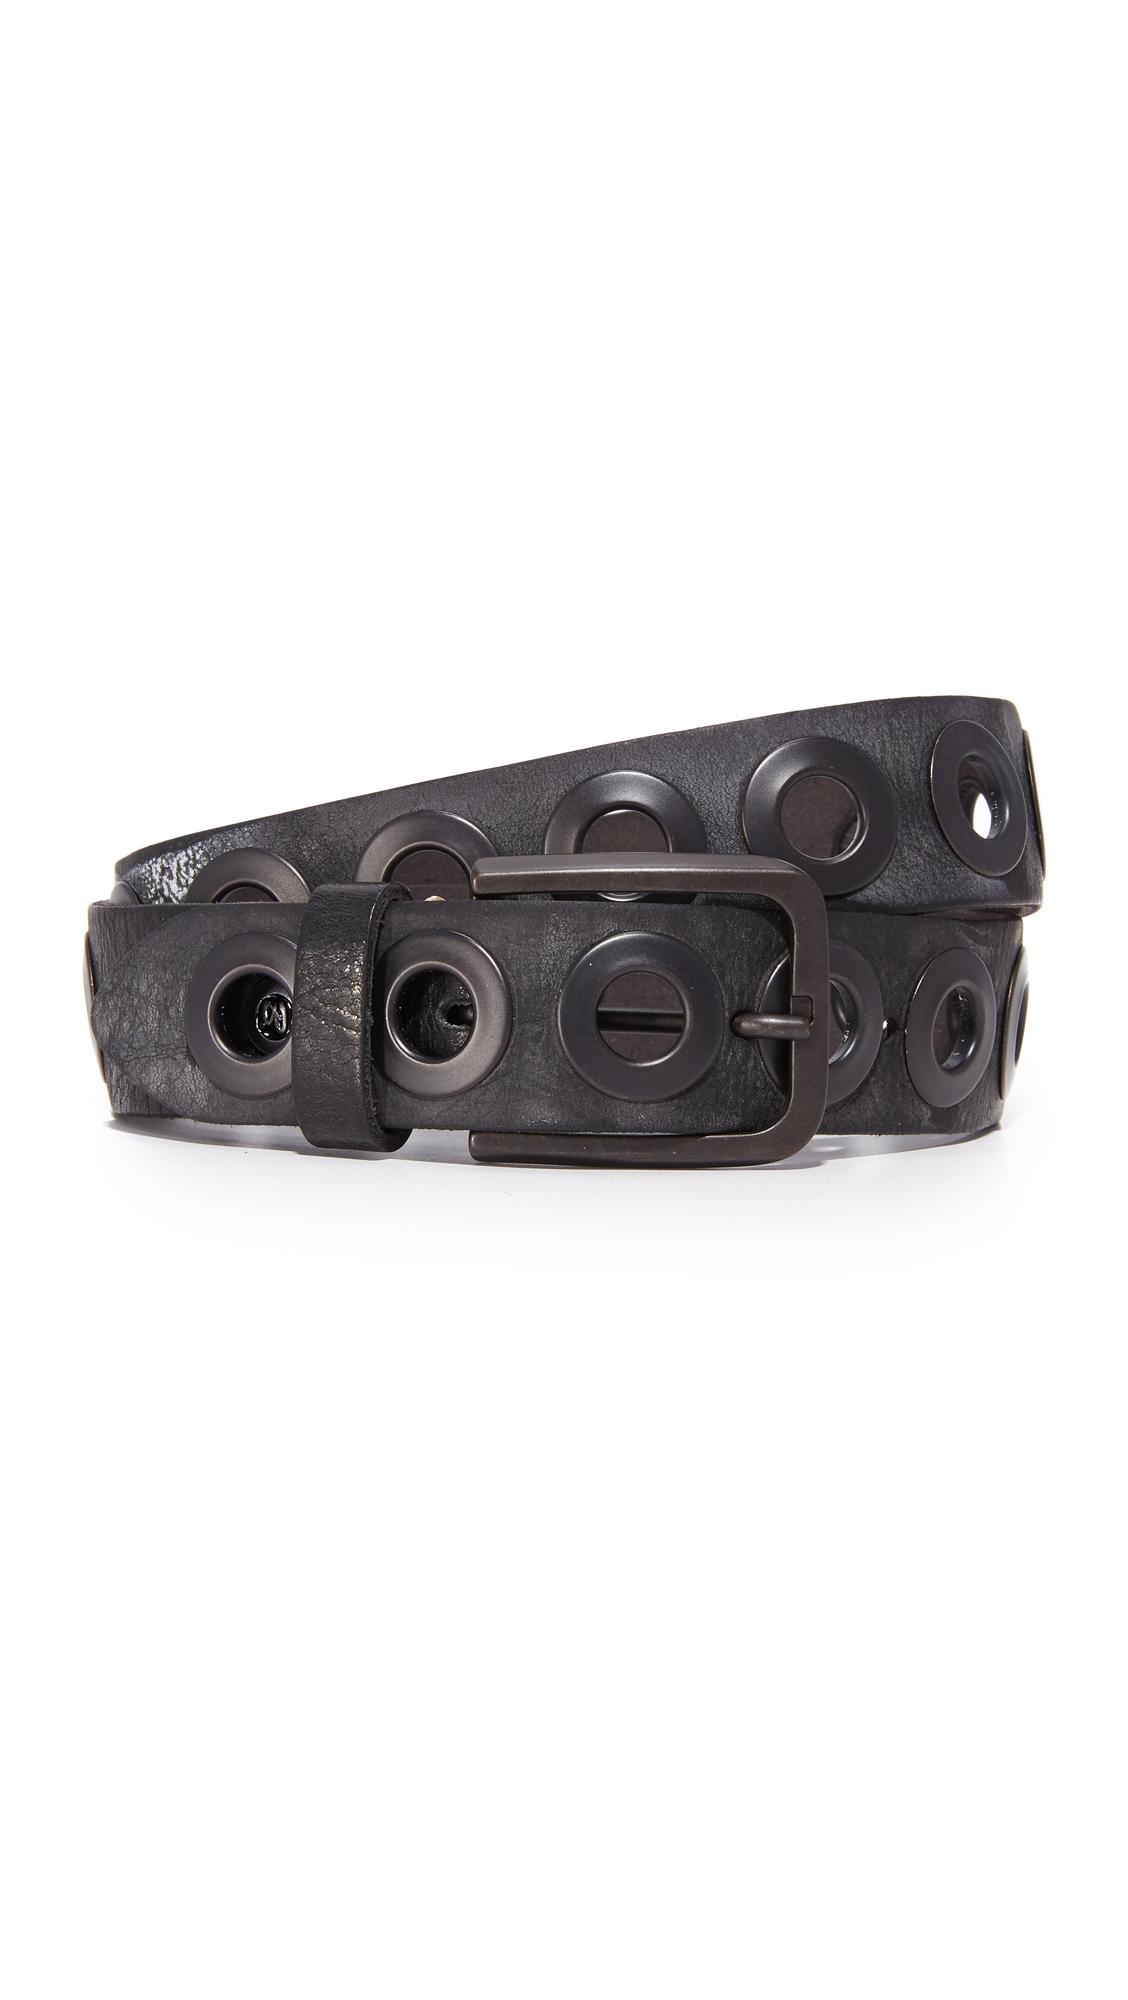 B. Belt Gunmetal Ring Belt - Black